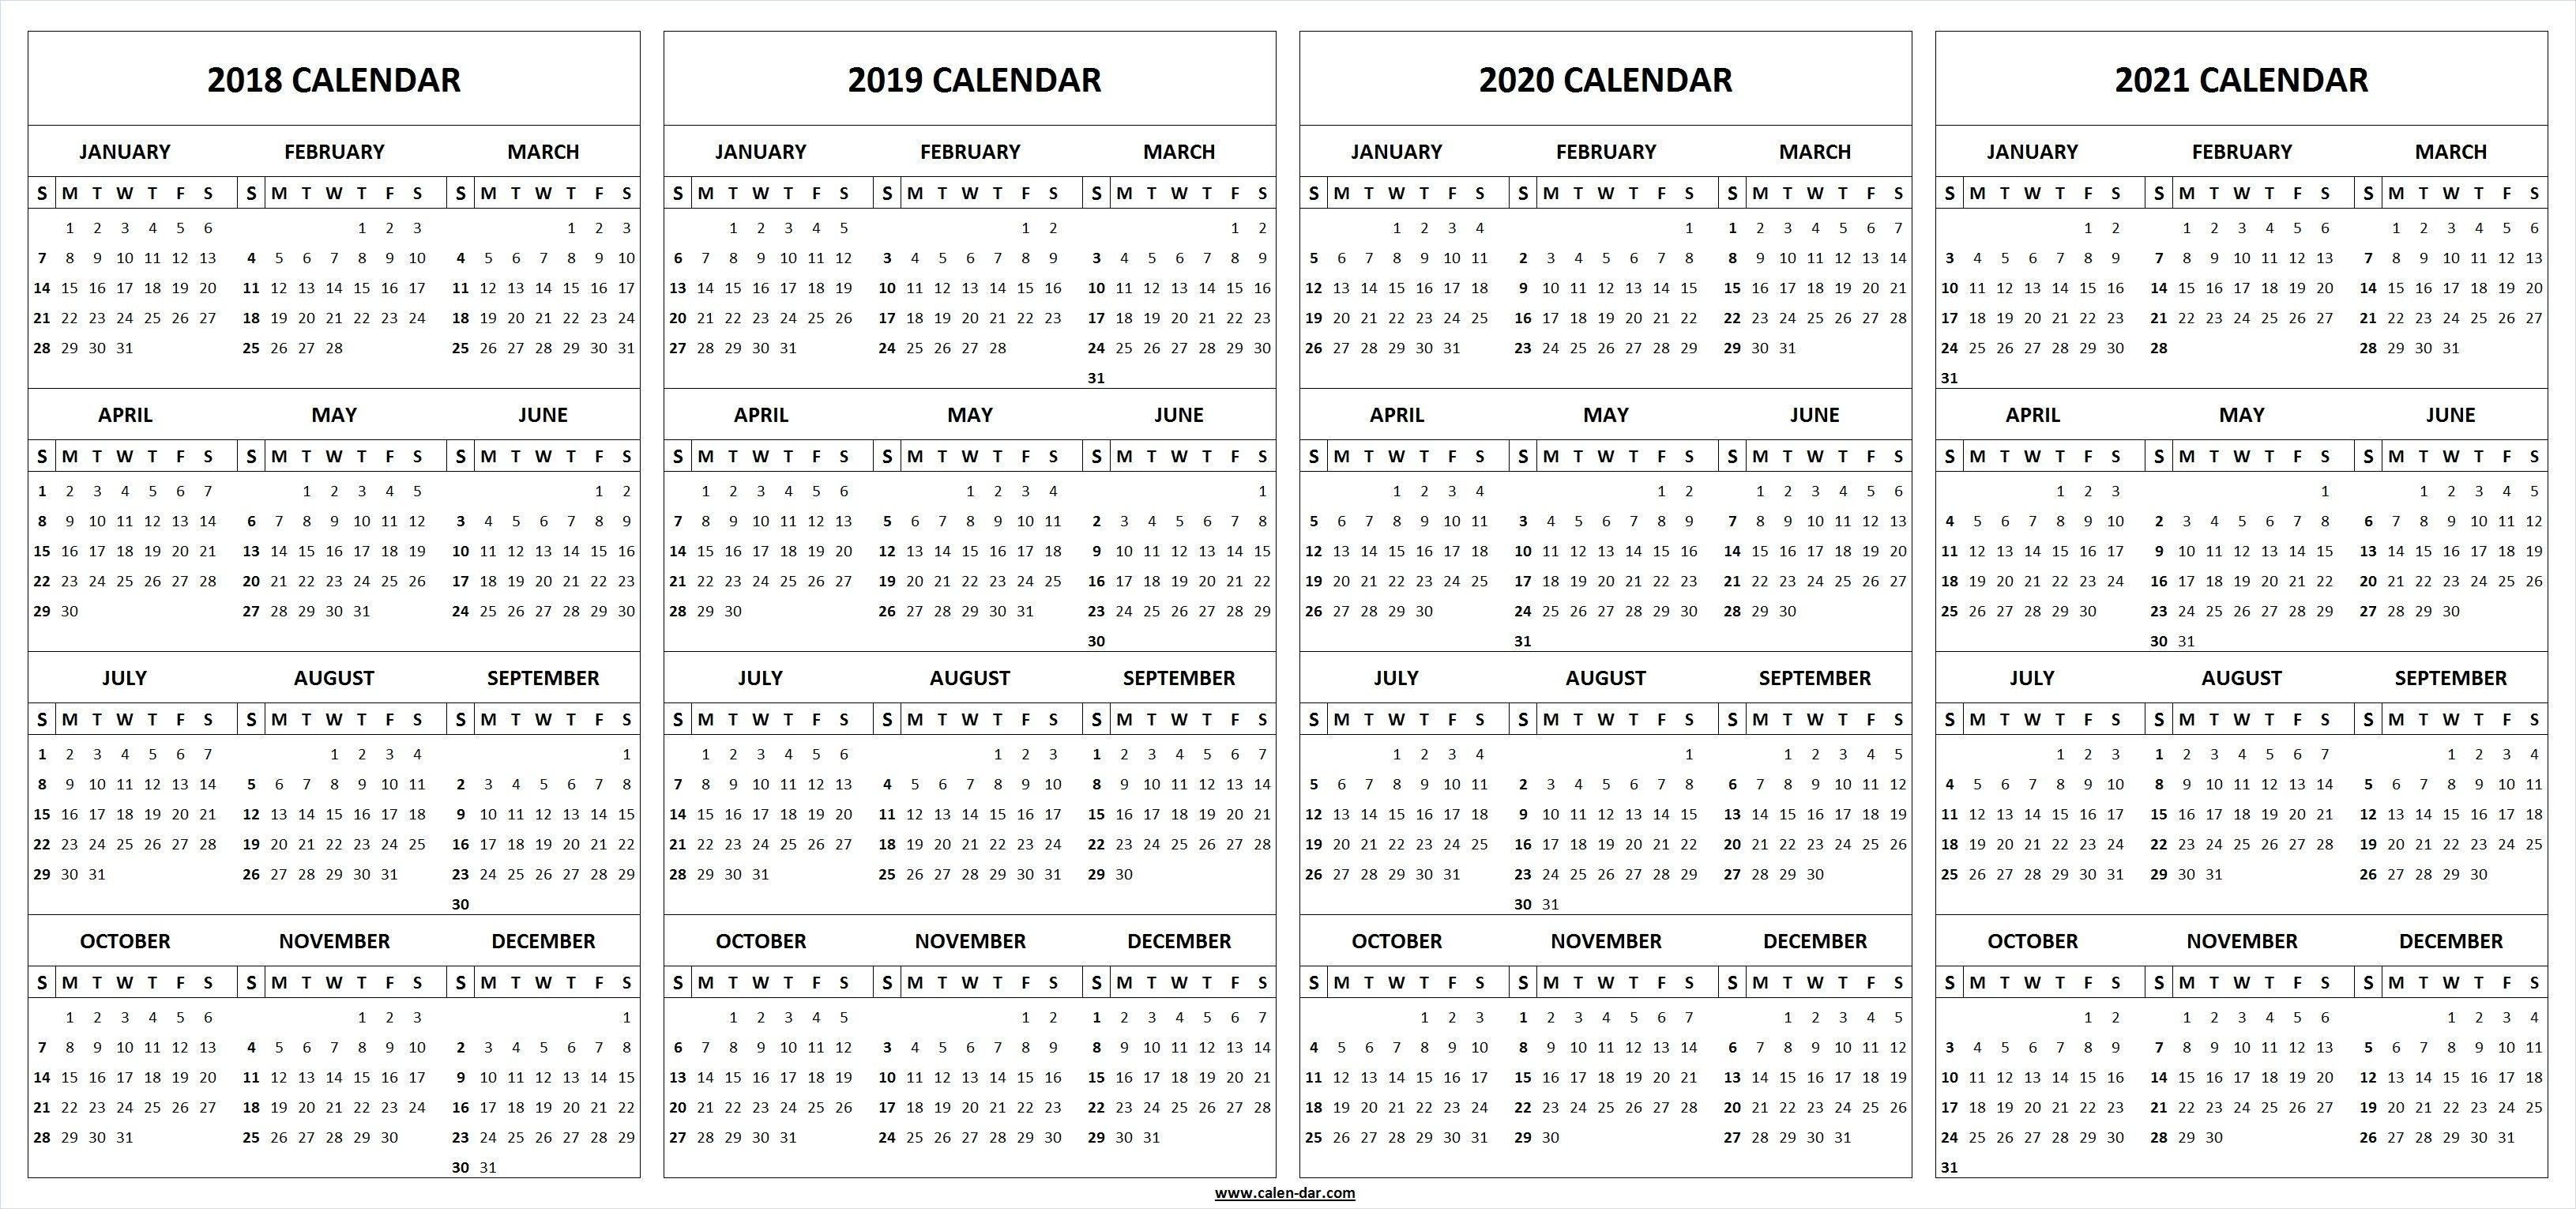 4 Four Year 2018 2019 2020 2021 Calendar Printable Template Perky 2020 Calendar Template Indesign